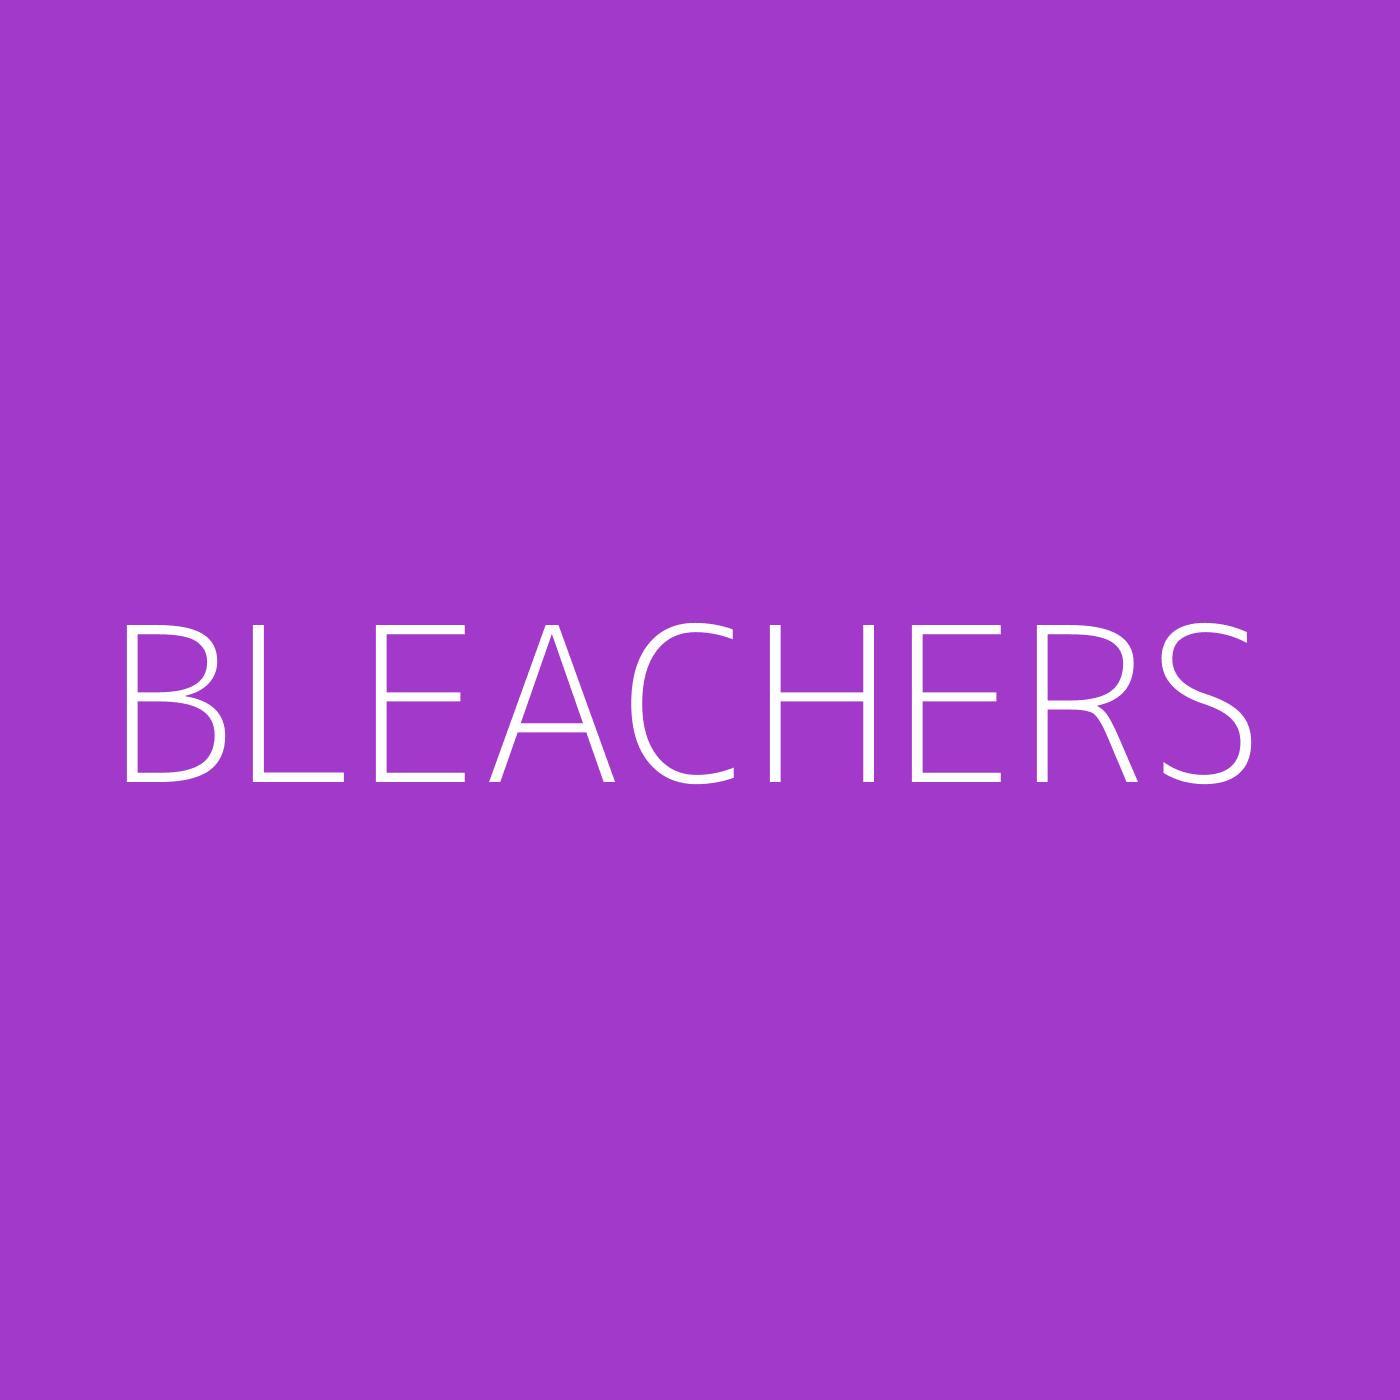 Bleachers Playlist Artwork